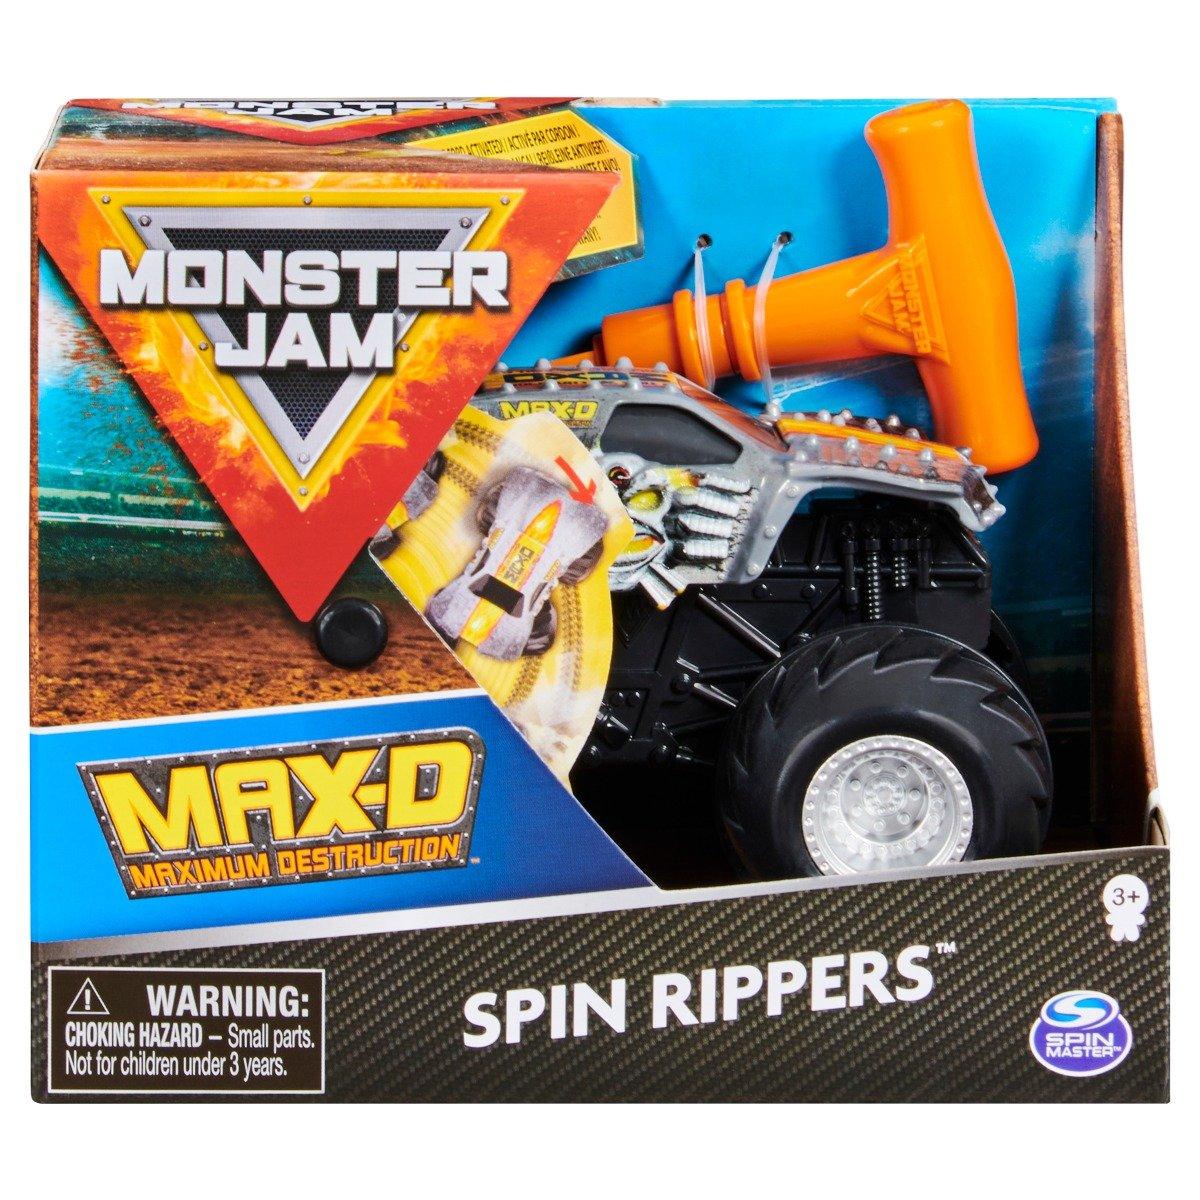 Masinuta Monster Jam, Scara 1:43, Max-D Spin Rippers